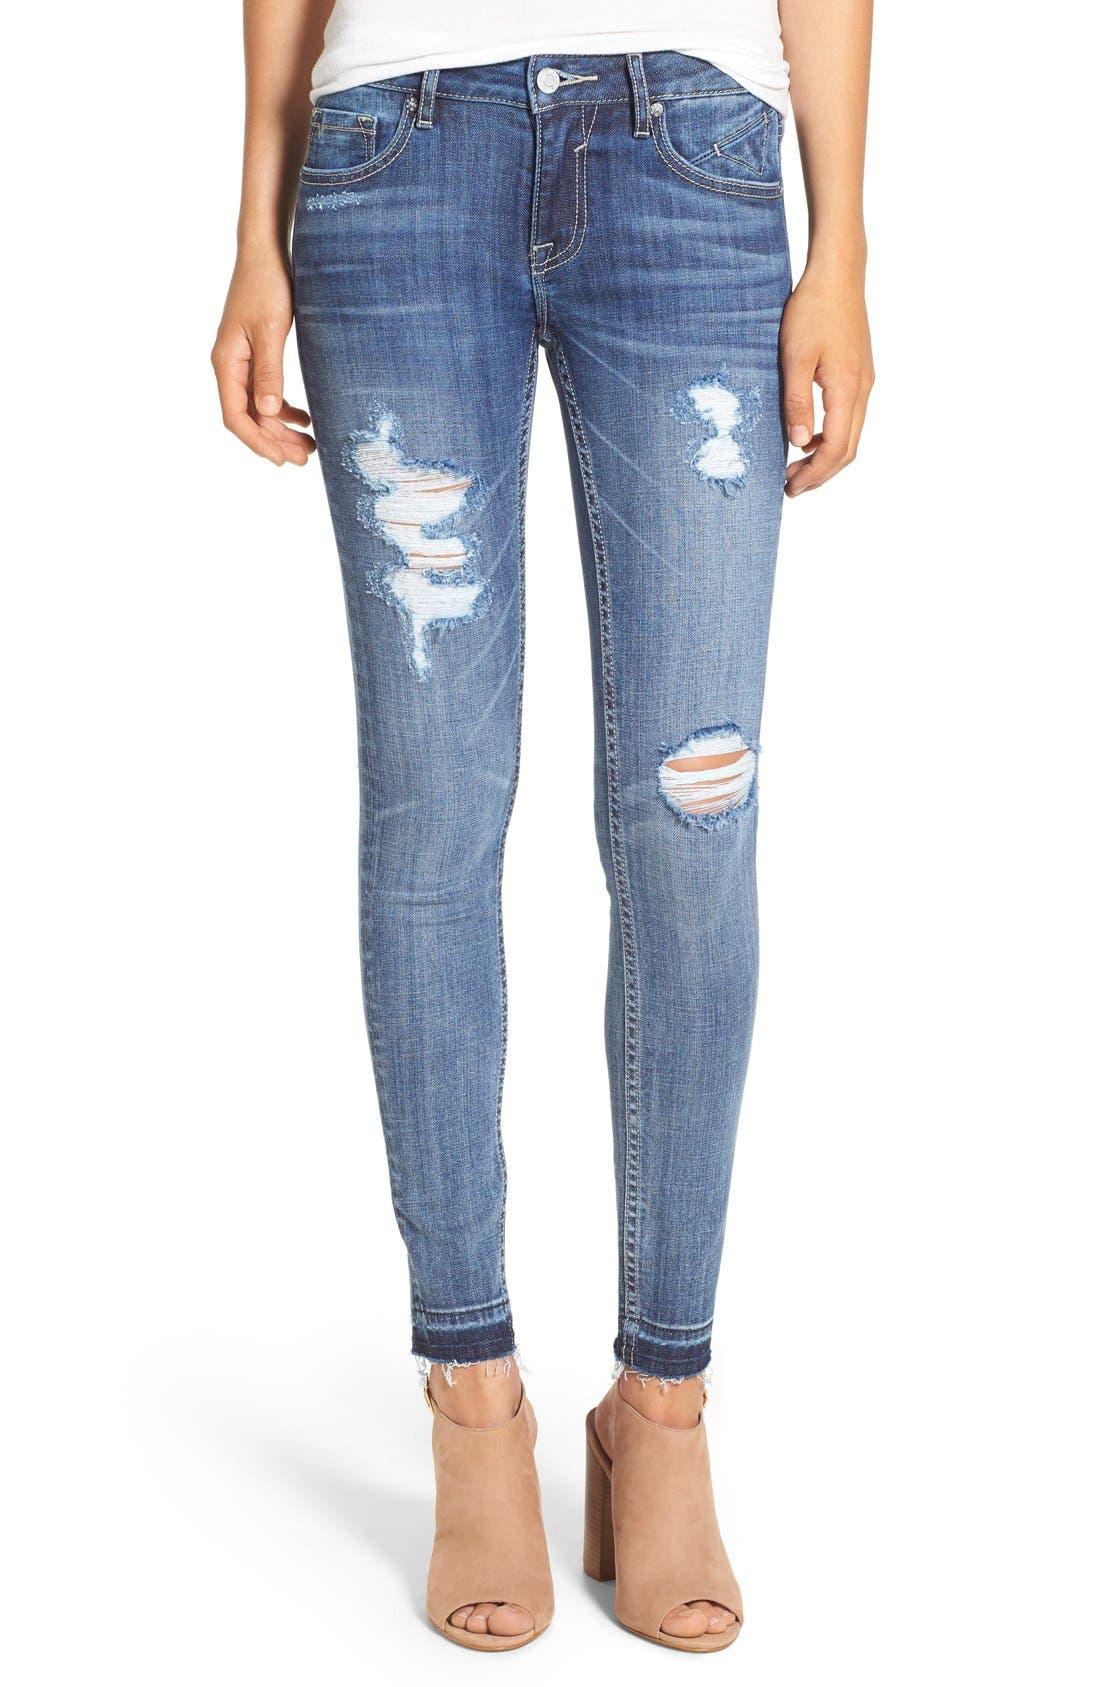 Alternate Image 1 Selected - Vigoss 'Chelsea' Destroyed Skinny Jeans